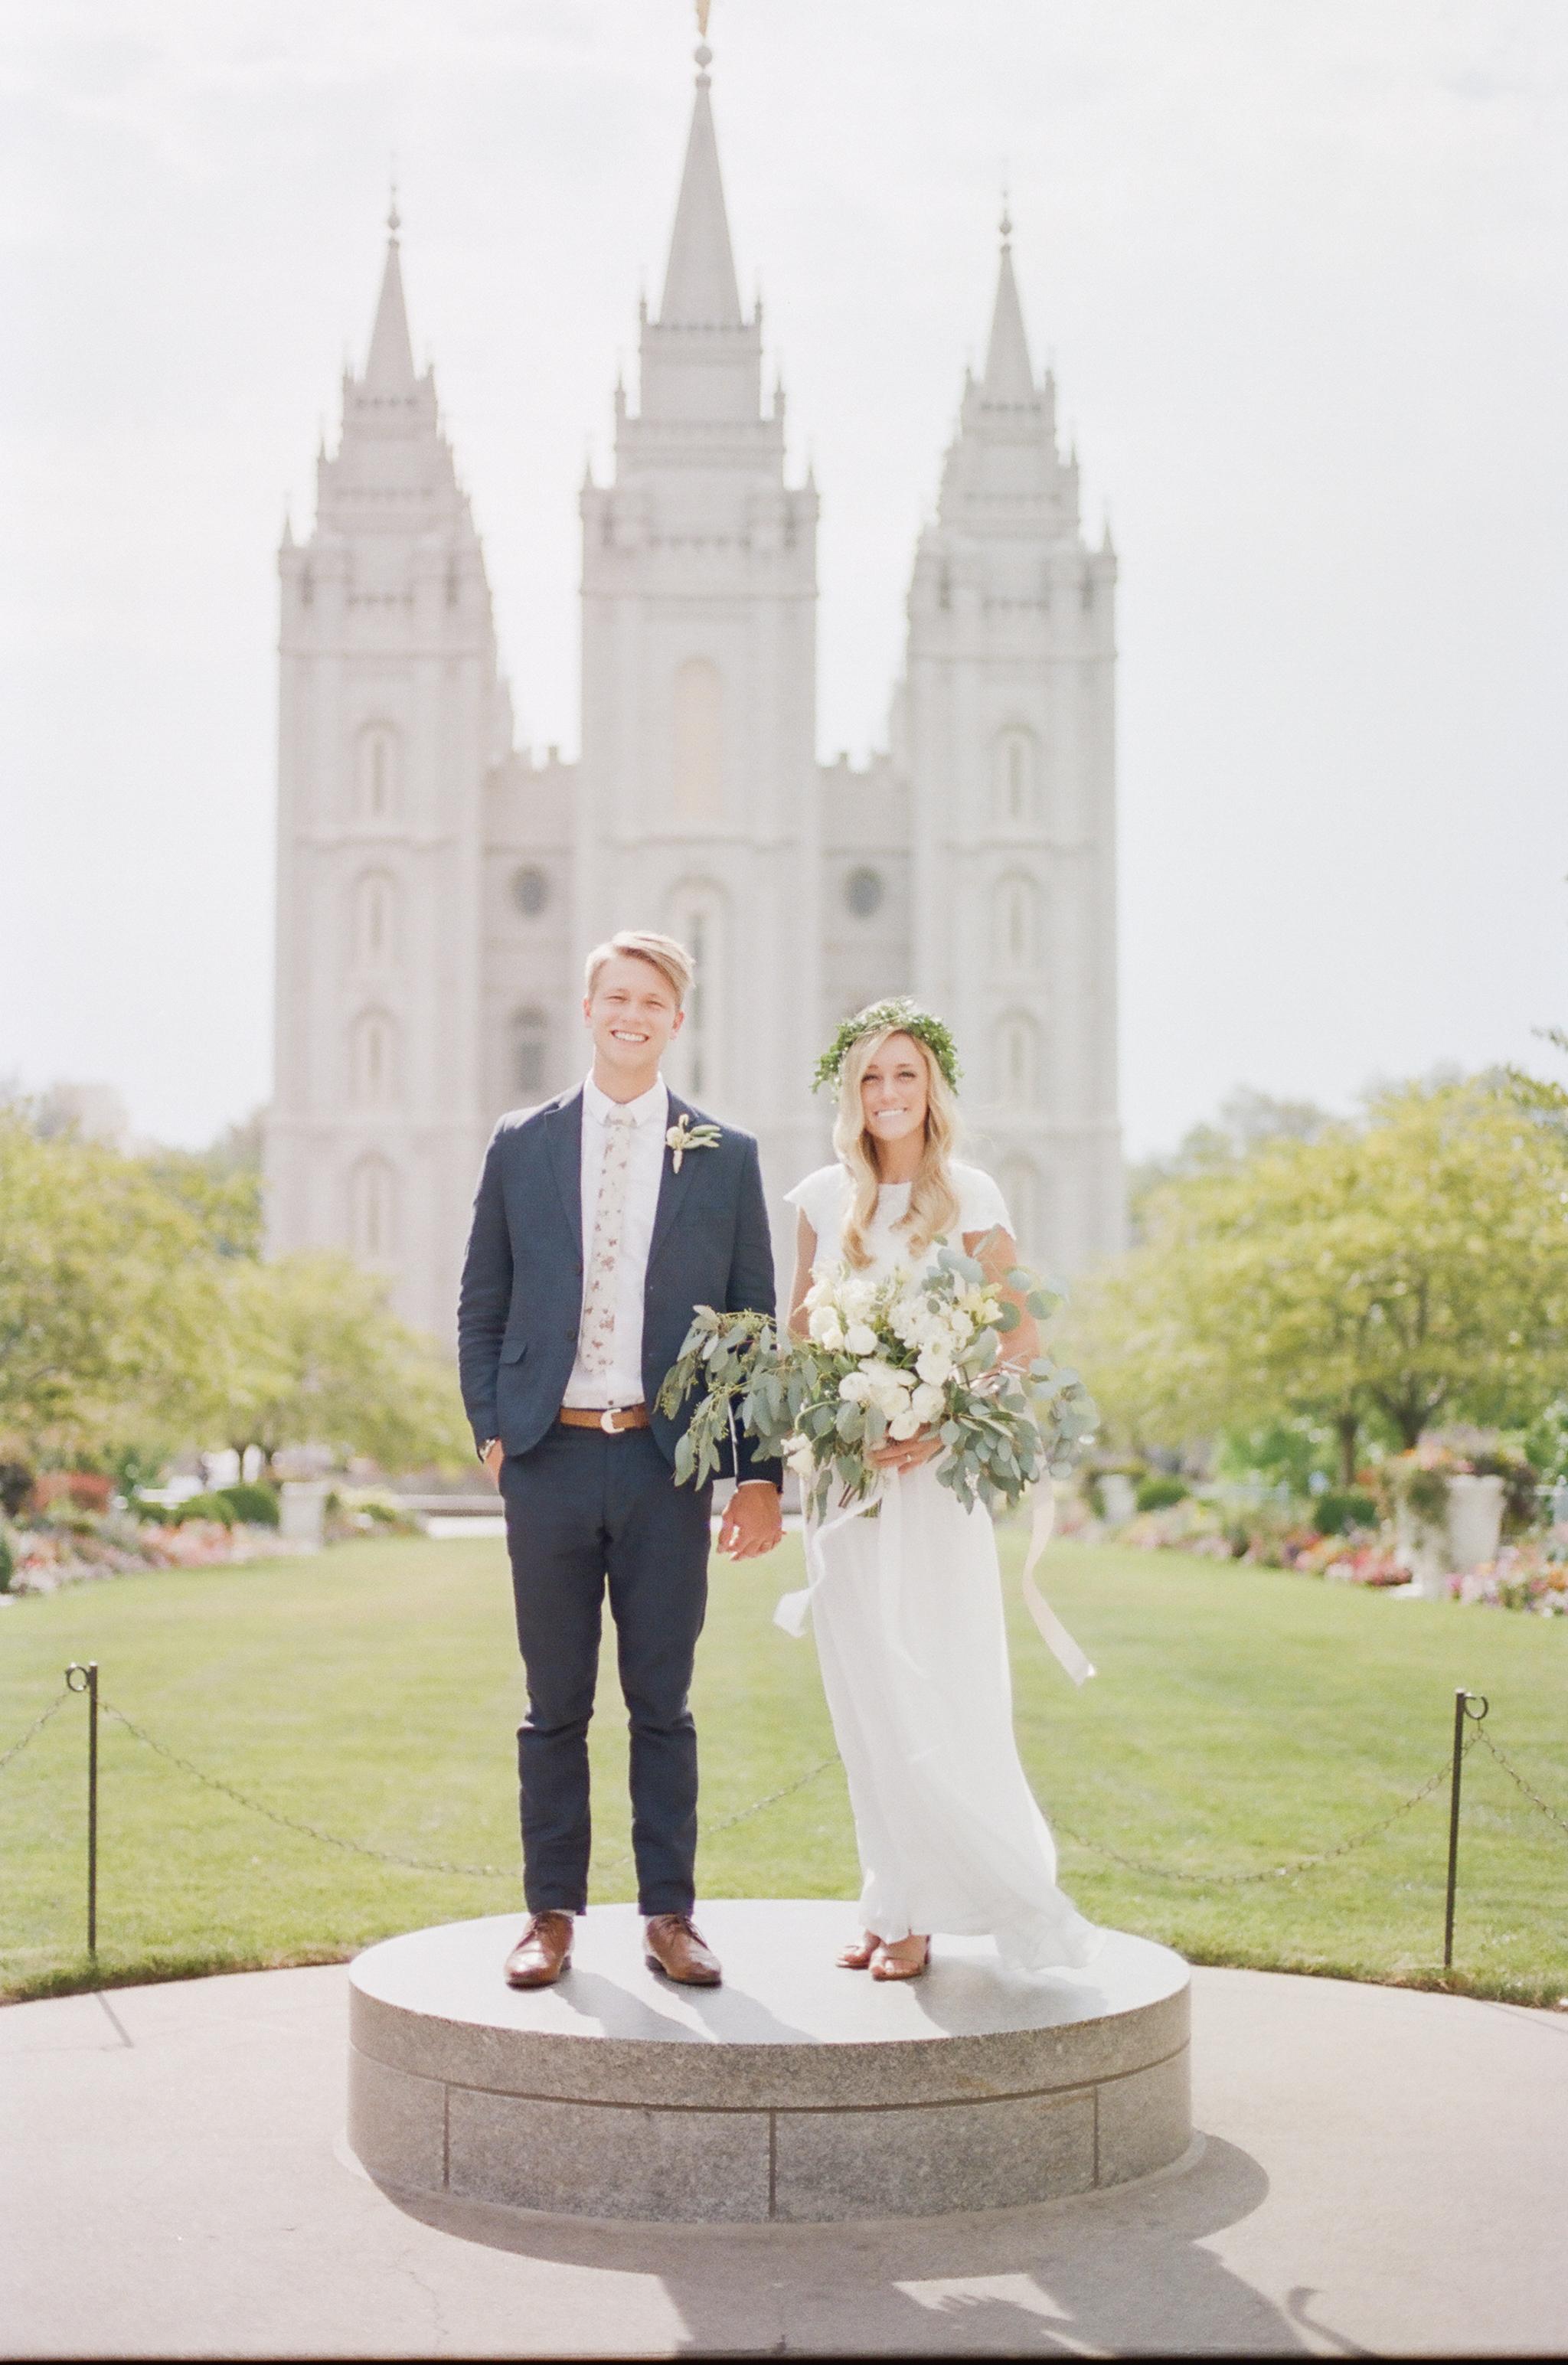 Wynona Benson Photography - Jaleisa & Logan Romantic Elegant Utah Wedding00055.jpg